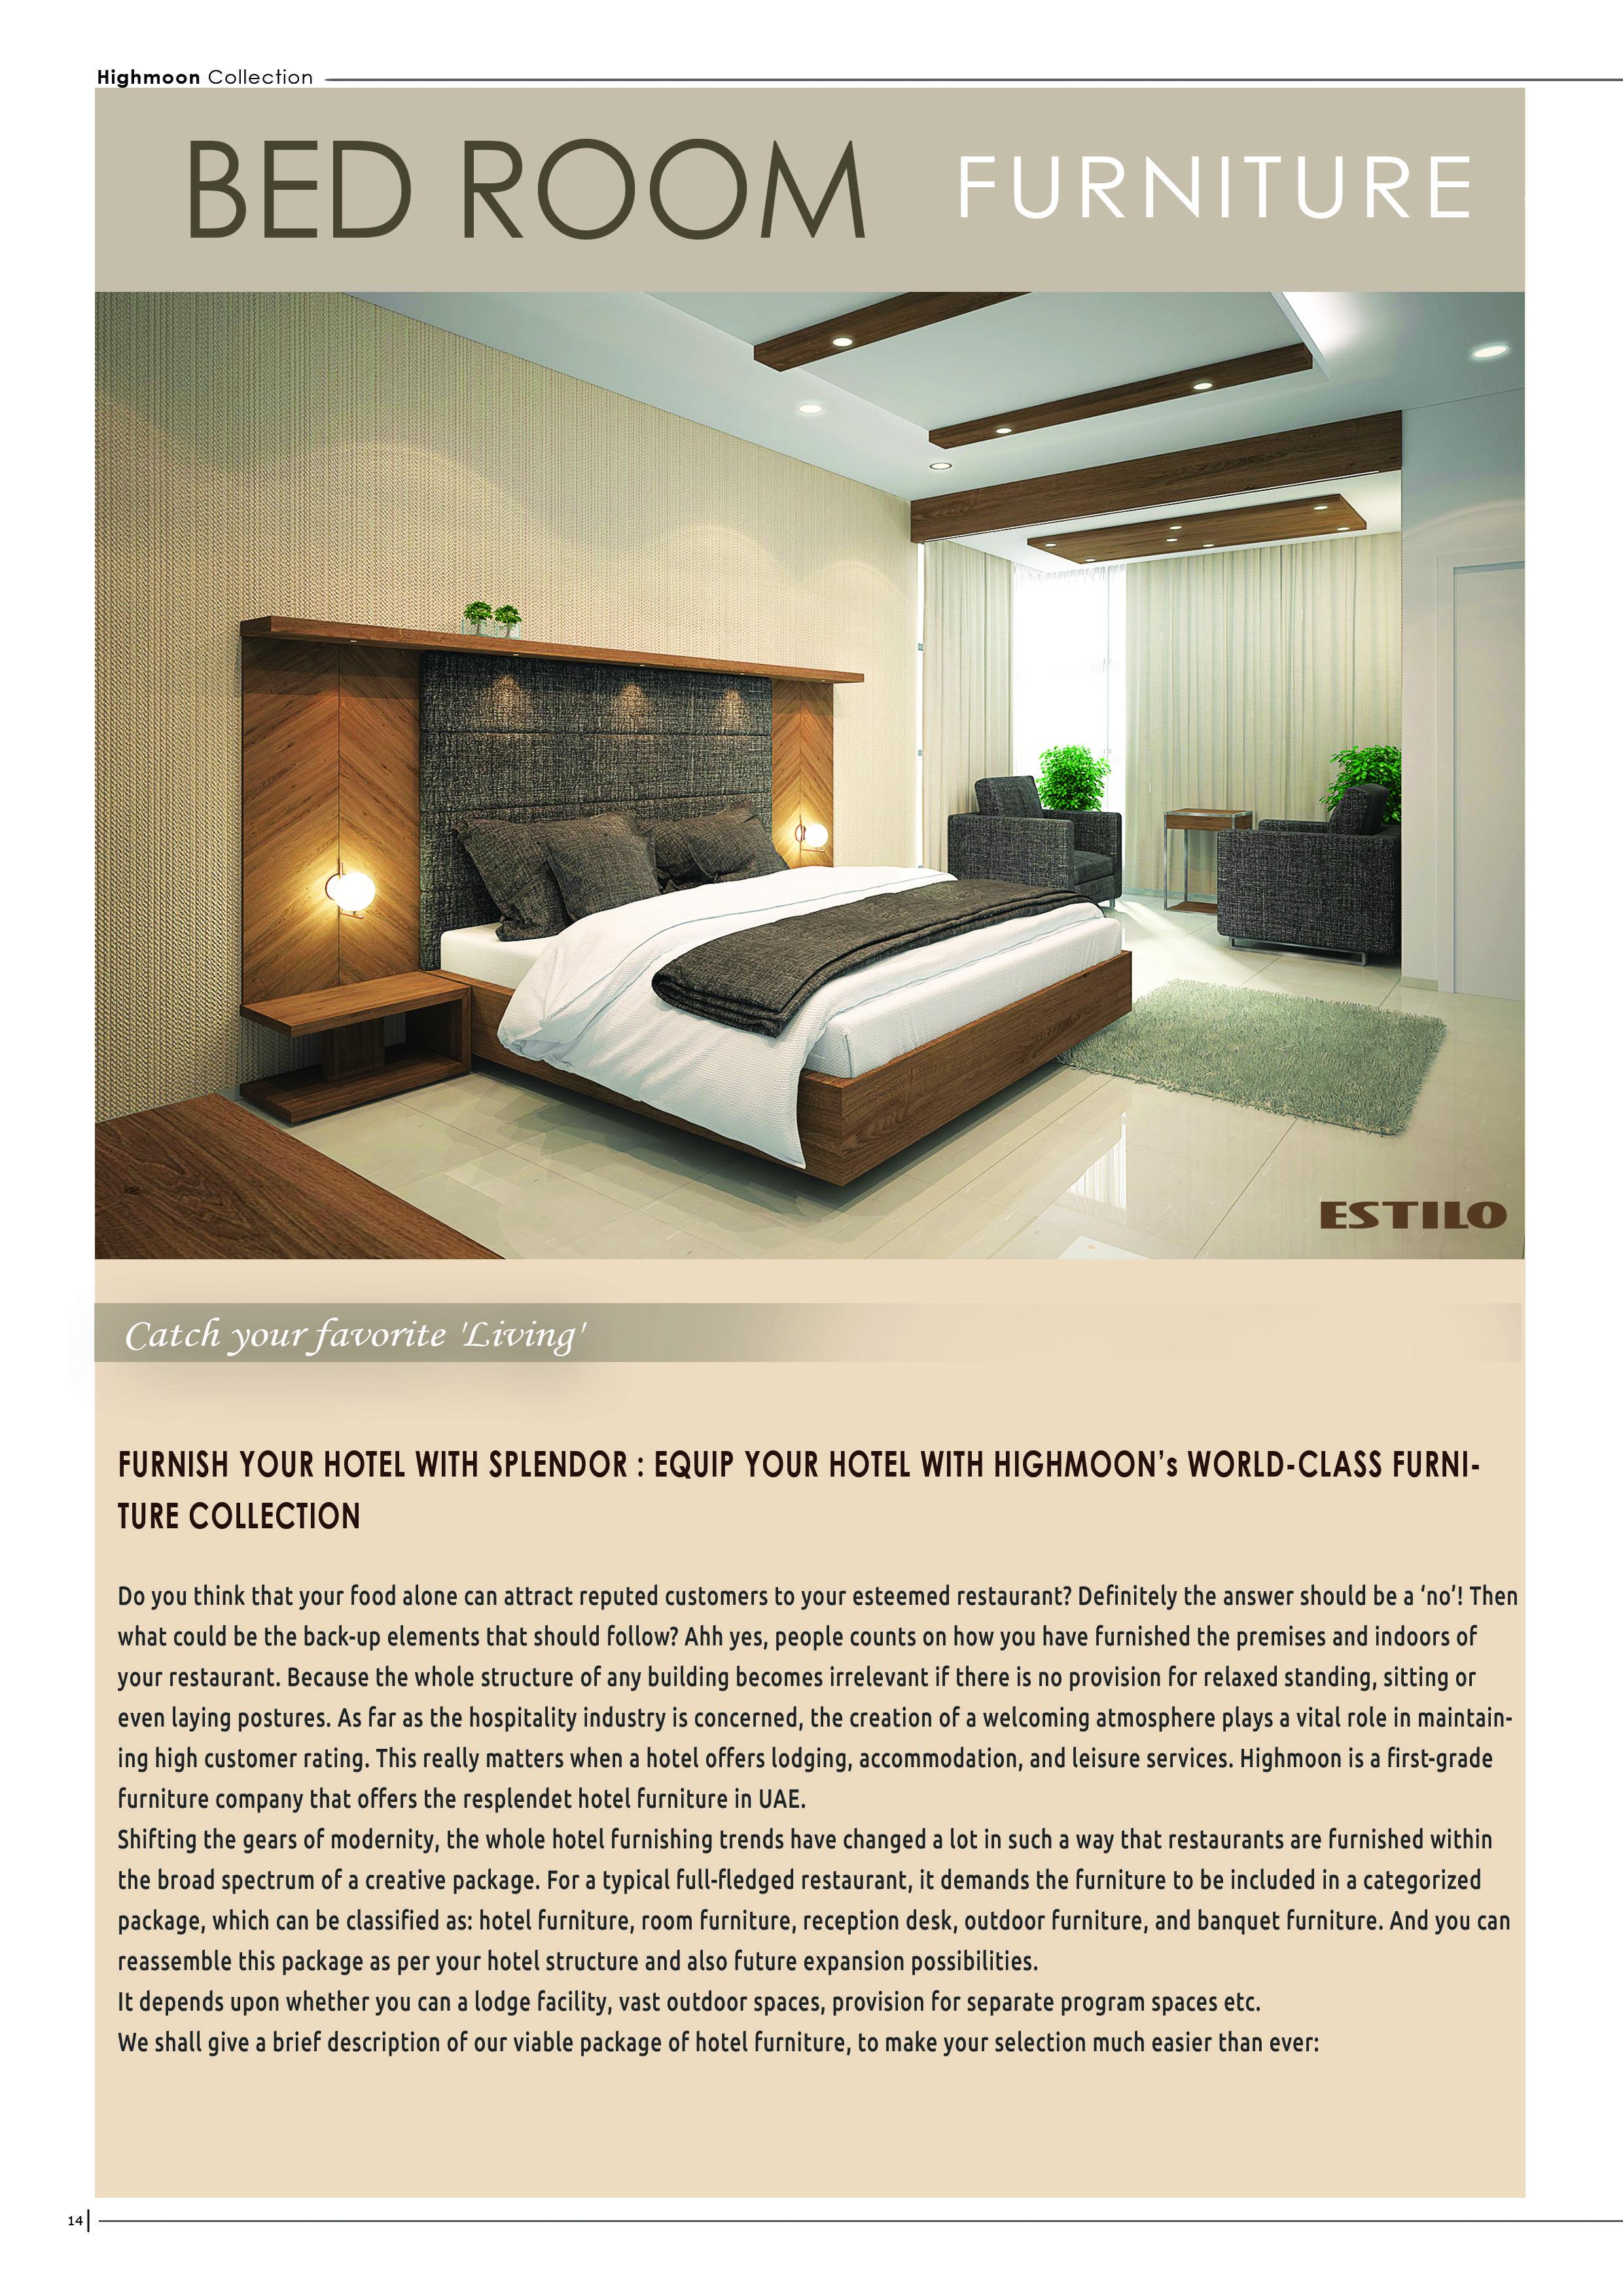 Swell Hotel Furniture Hotel Furniture Dubai Uae Furniture Download Free Architecture Designs Scobabritishbridgeorg